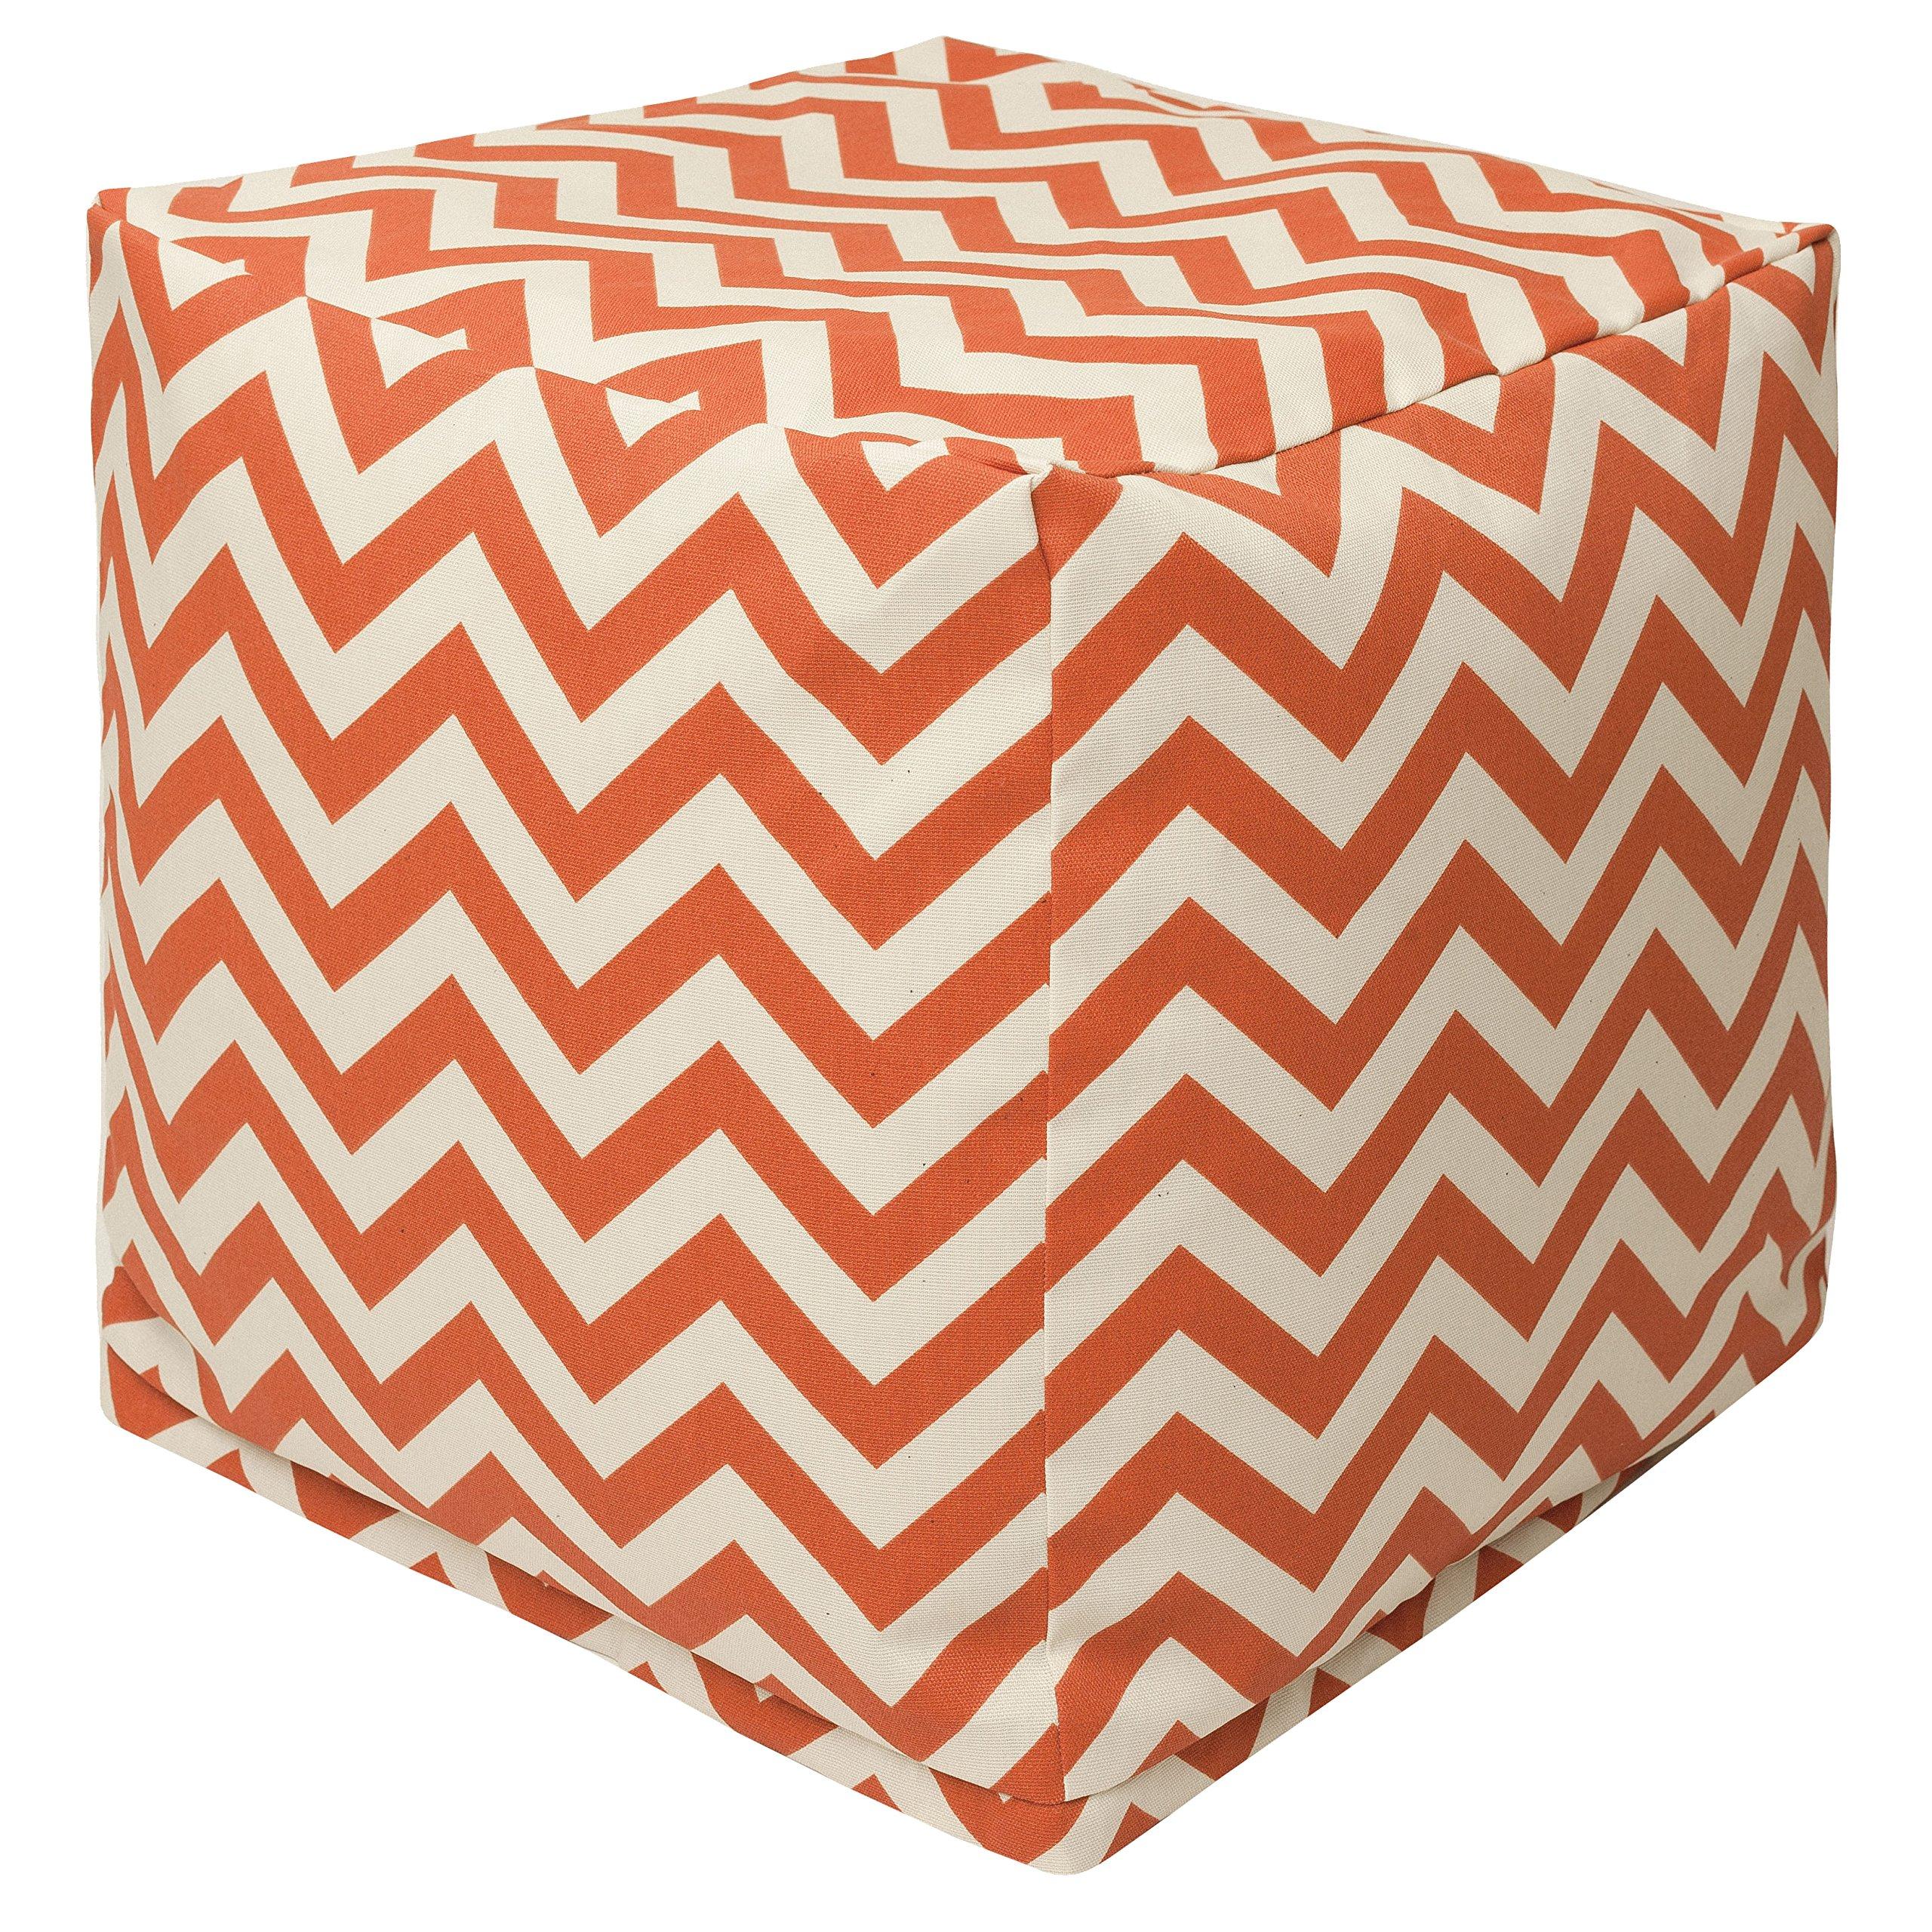 Majestic Home Goods Burnt Orange Chevron Indoor/Outdoor Bean Bag Ottoman Pouf Cube 17'' L x 17'' W x 17'' H